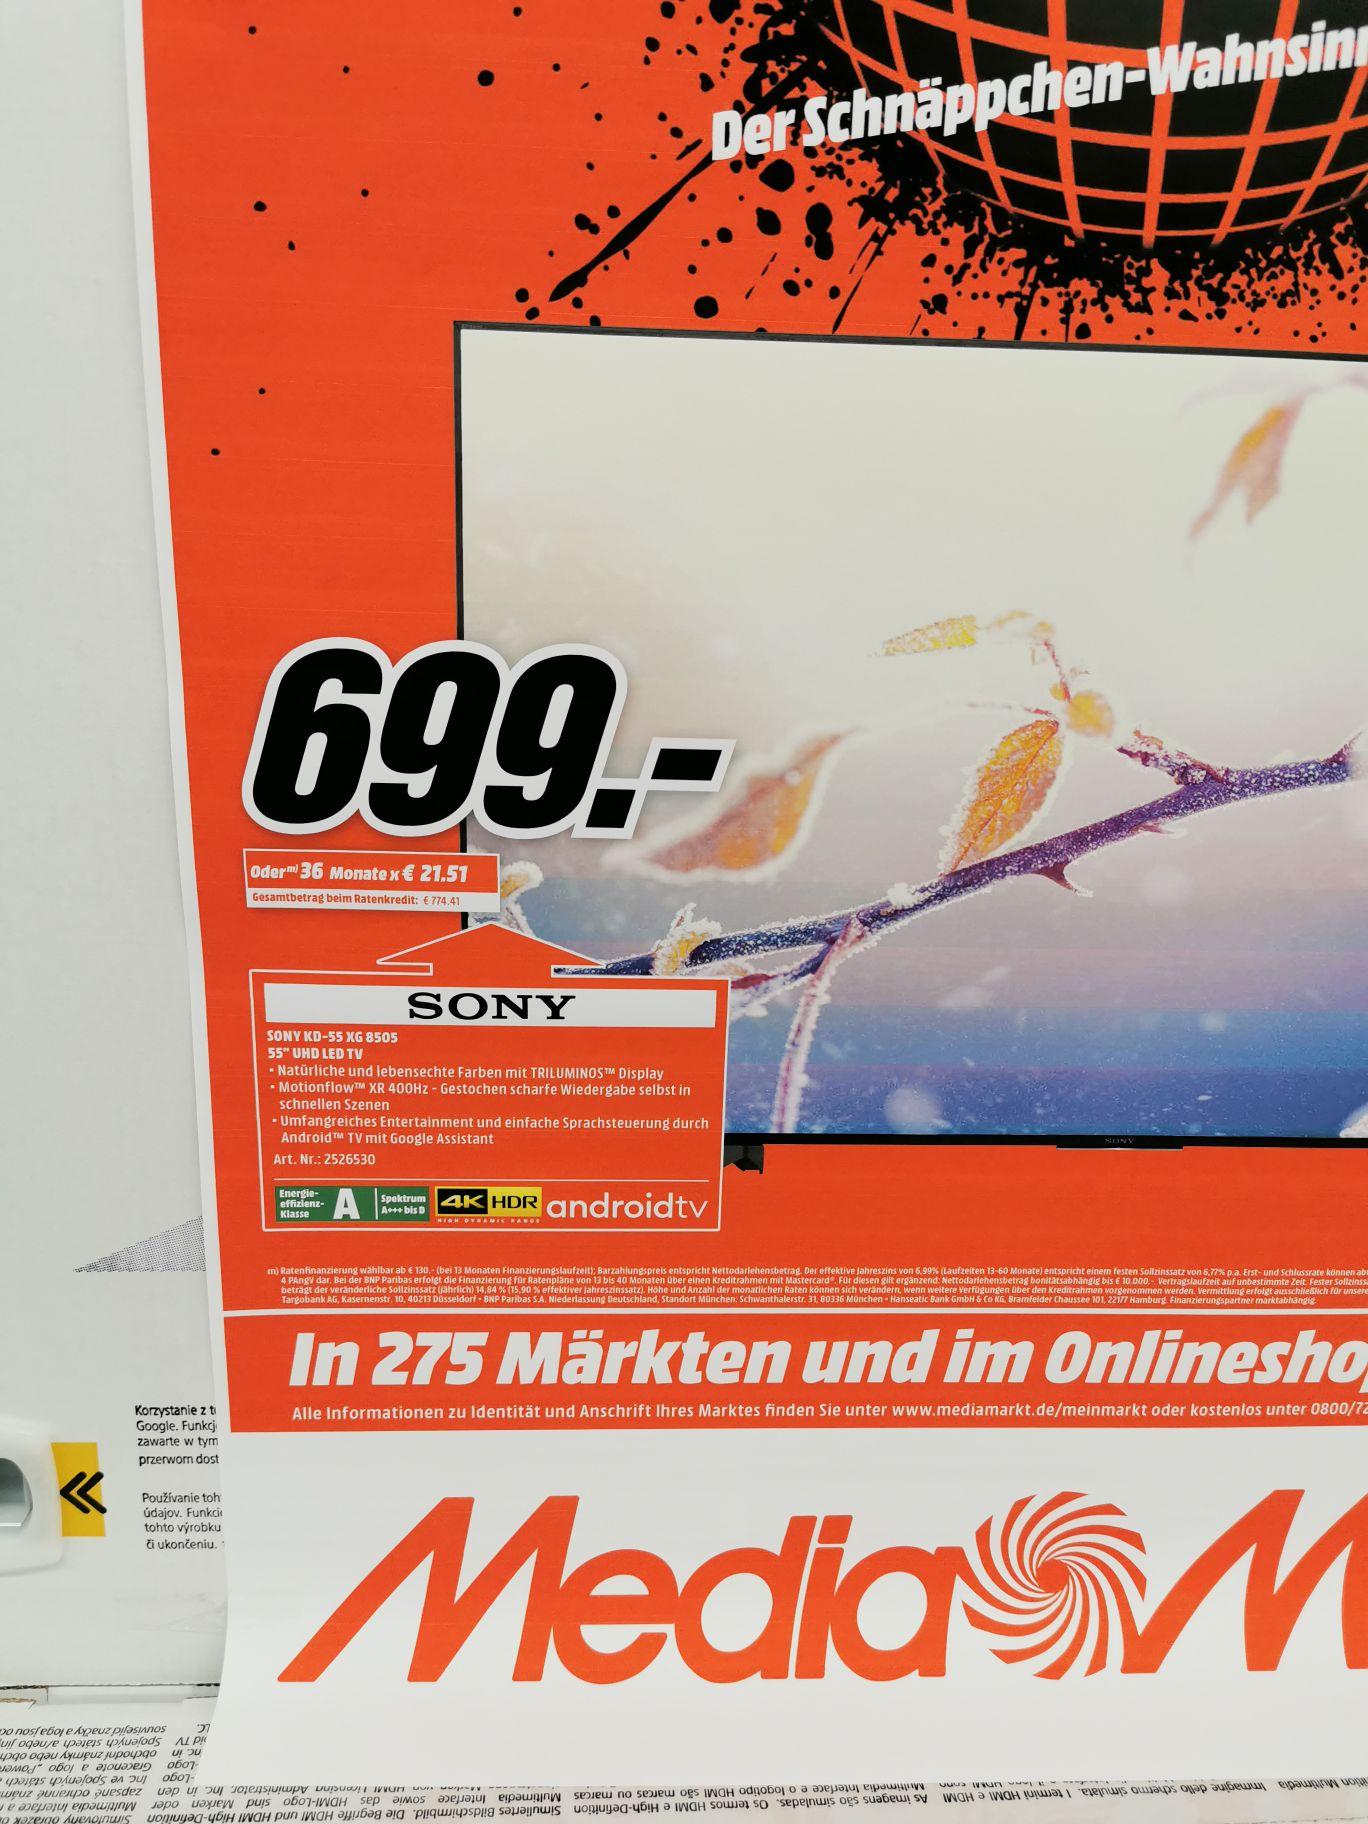 Sony 55 XG8505 - Media Markt Cyber Monday Tagesdeal